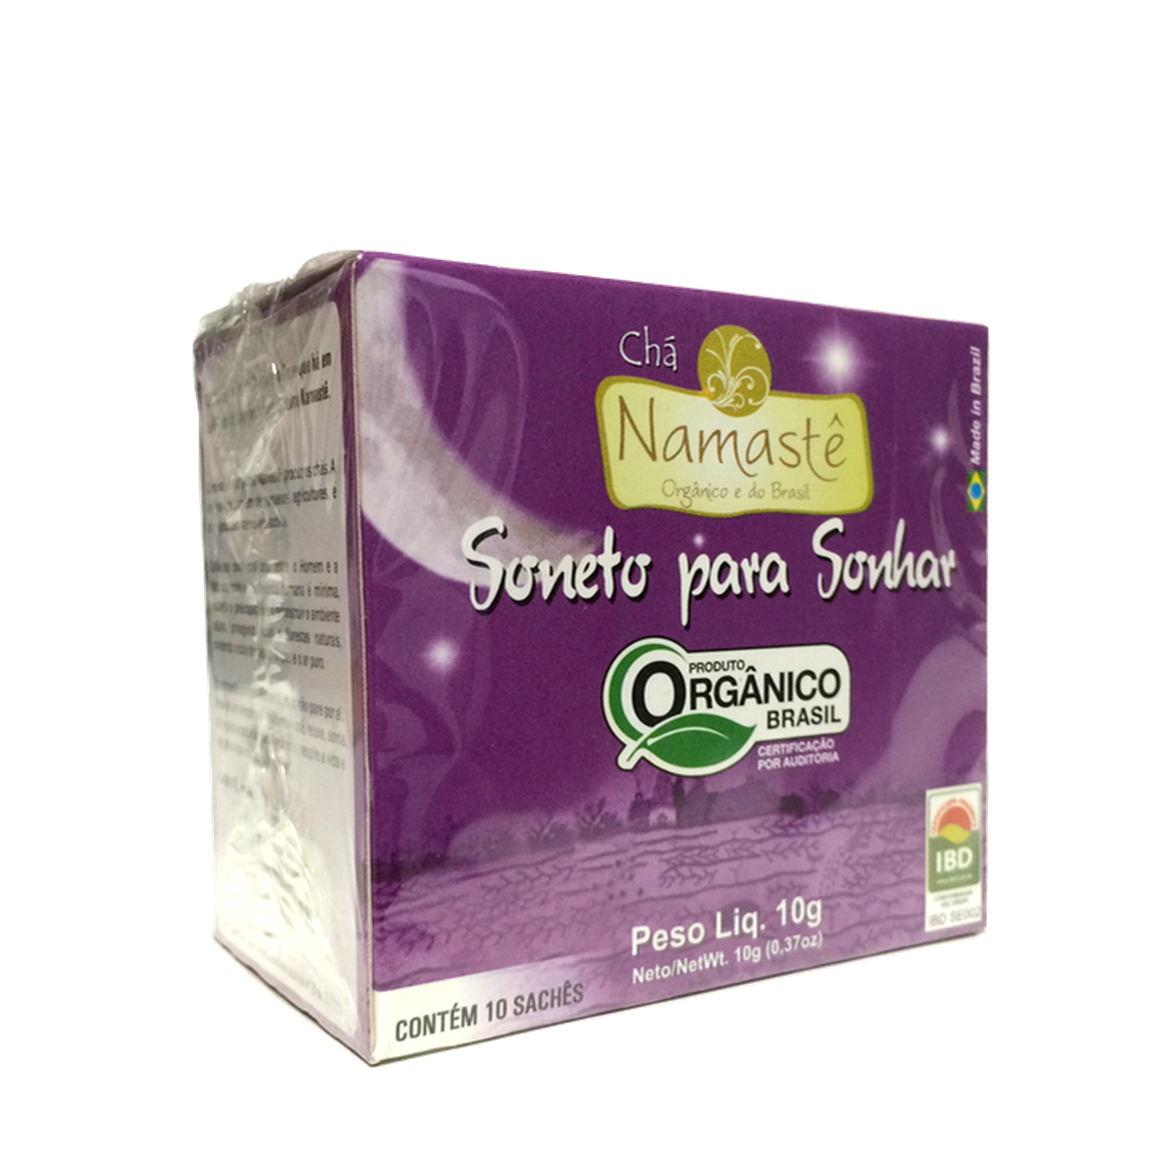 Chá Soneto p/ Sonhar (c/ 10 sachês) – Namastê